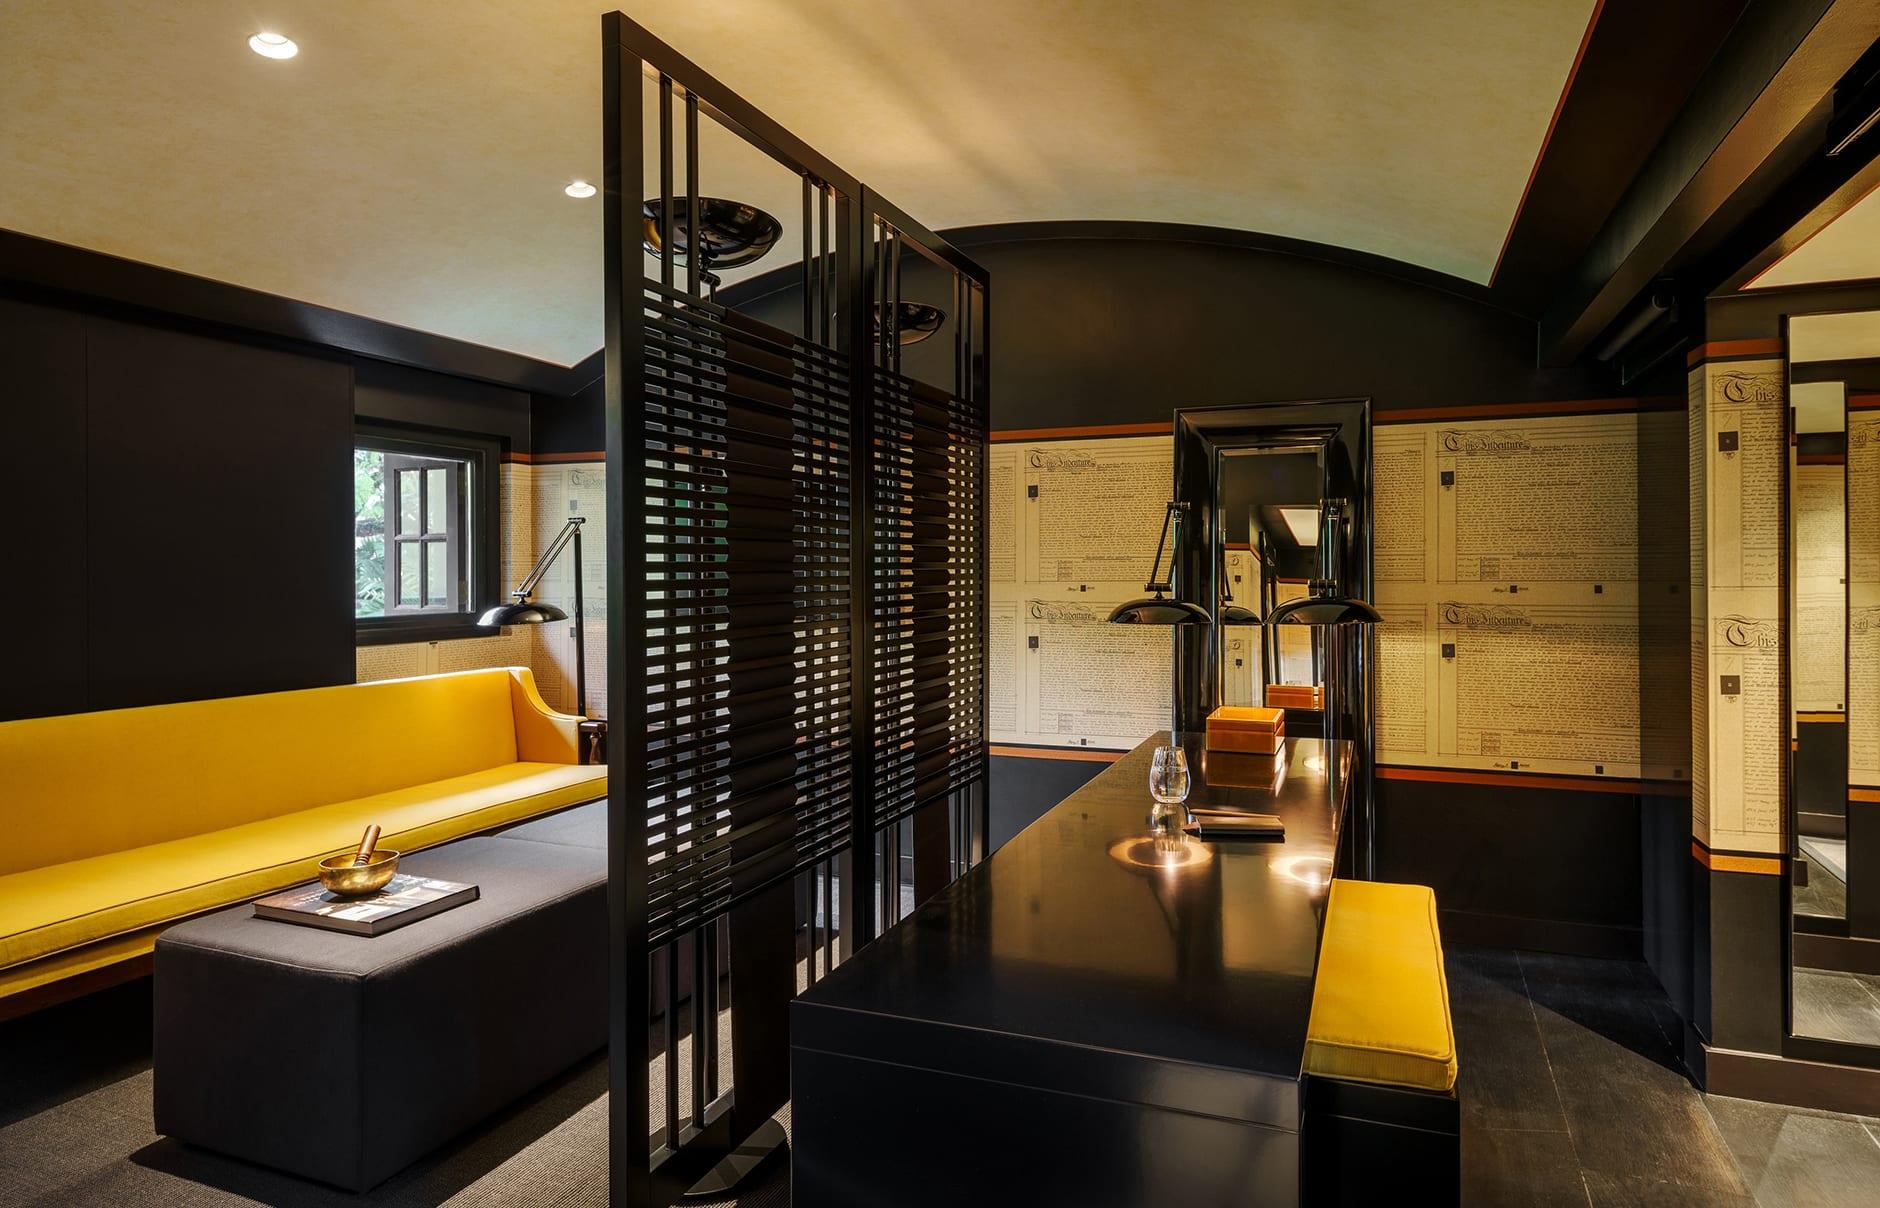 Six Senses Duxton, Singapore. Opium Suite living room. Luxury Hotel Review by TravelPlusStyle. Photo © Six Senses Hotels Resorts Spas